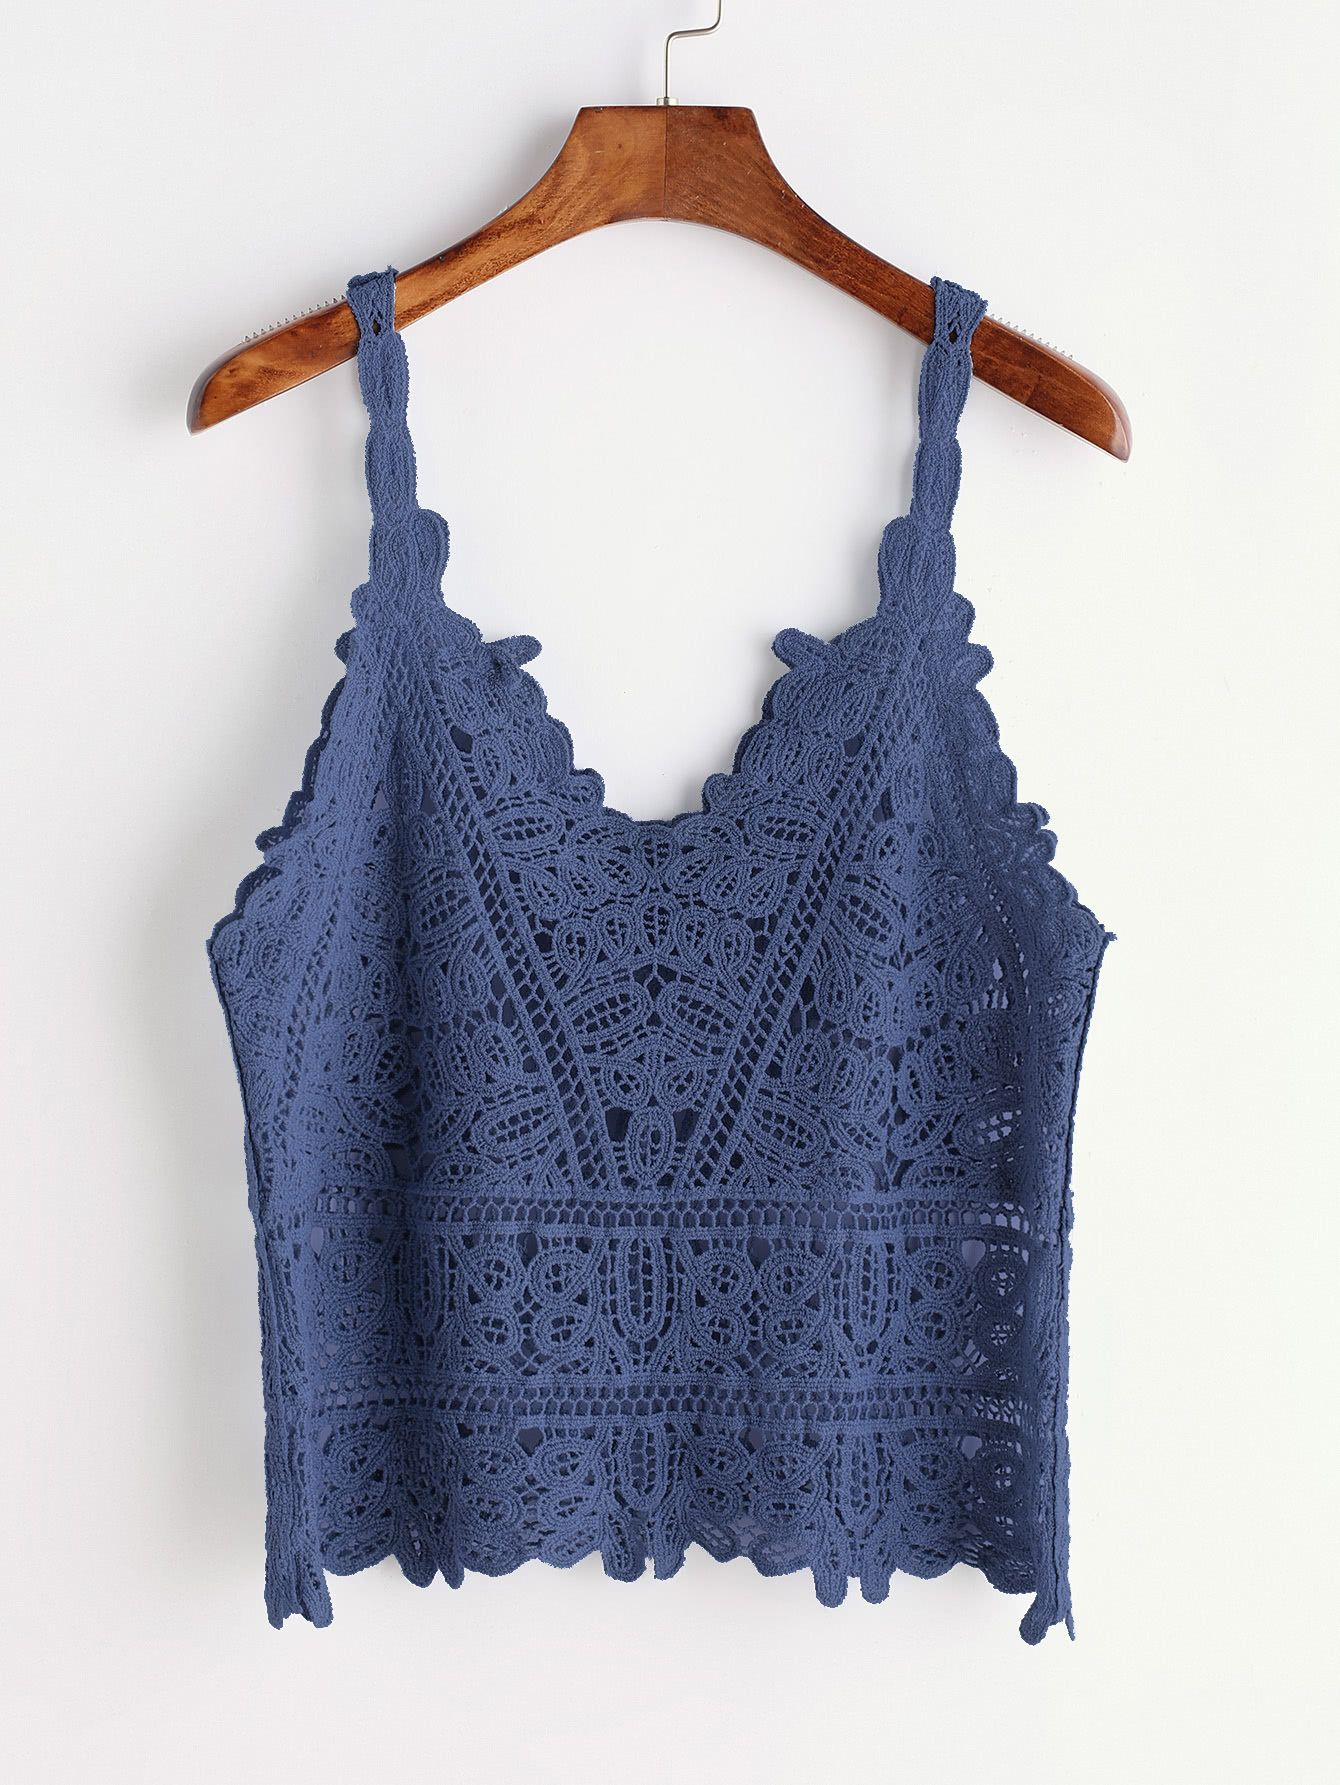 955ccf56c4dd75 Blue Crochet Hollow Out Cami TopFor Women-romwe